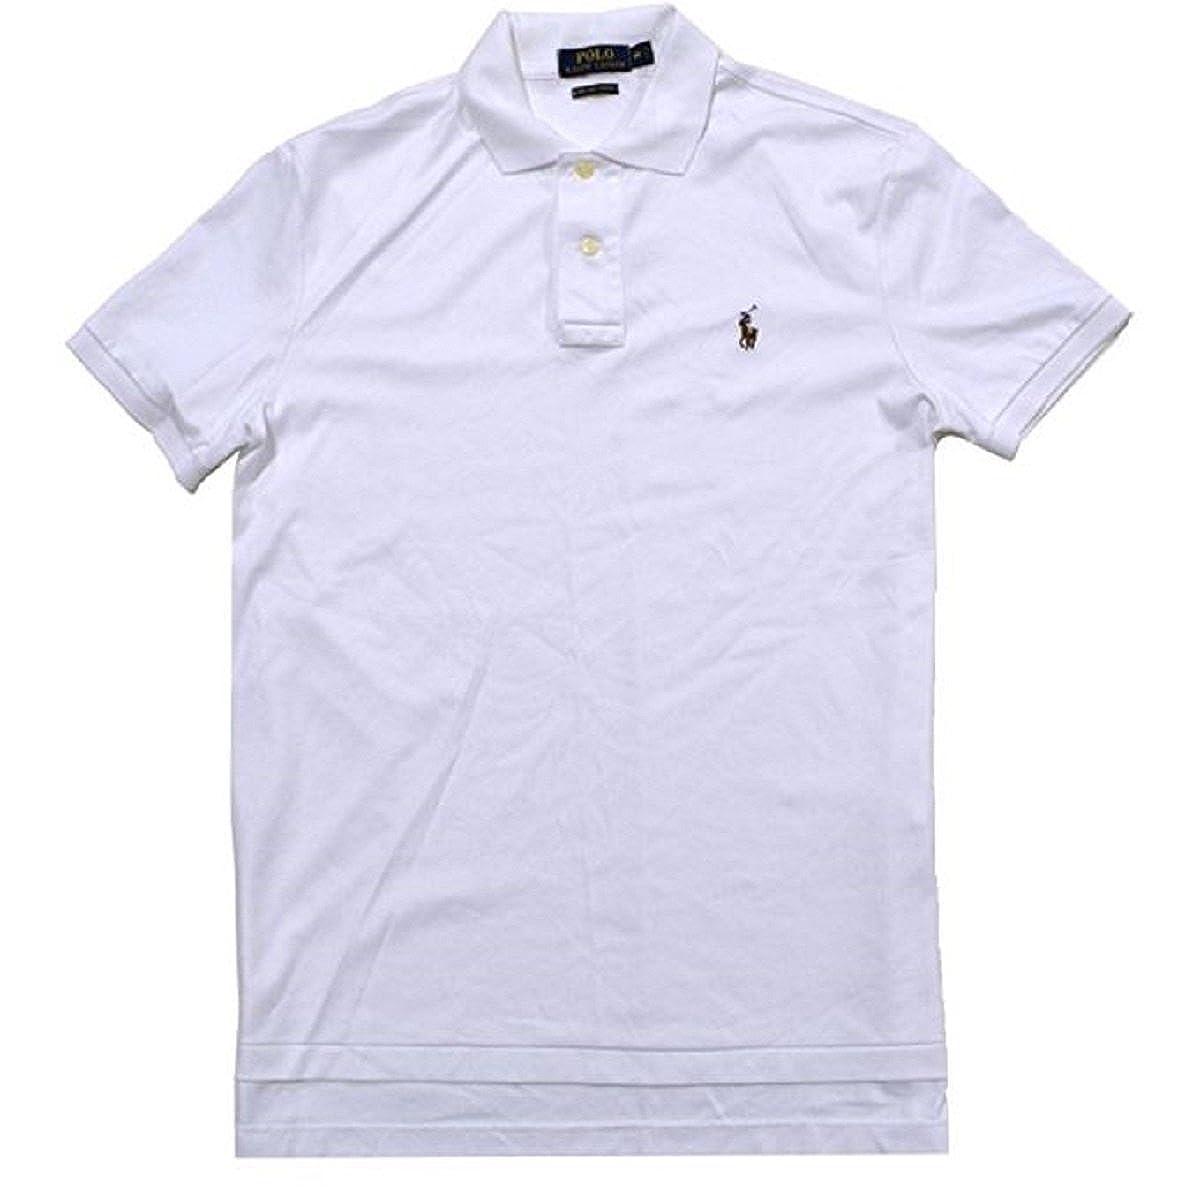 Polo Ralph Lauren Mens Cotton Heathered Polo Shirt At Amazon Mens